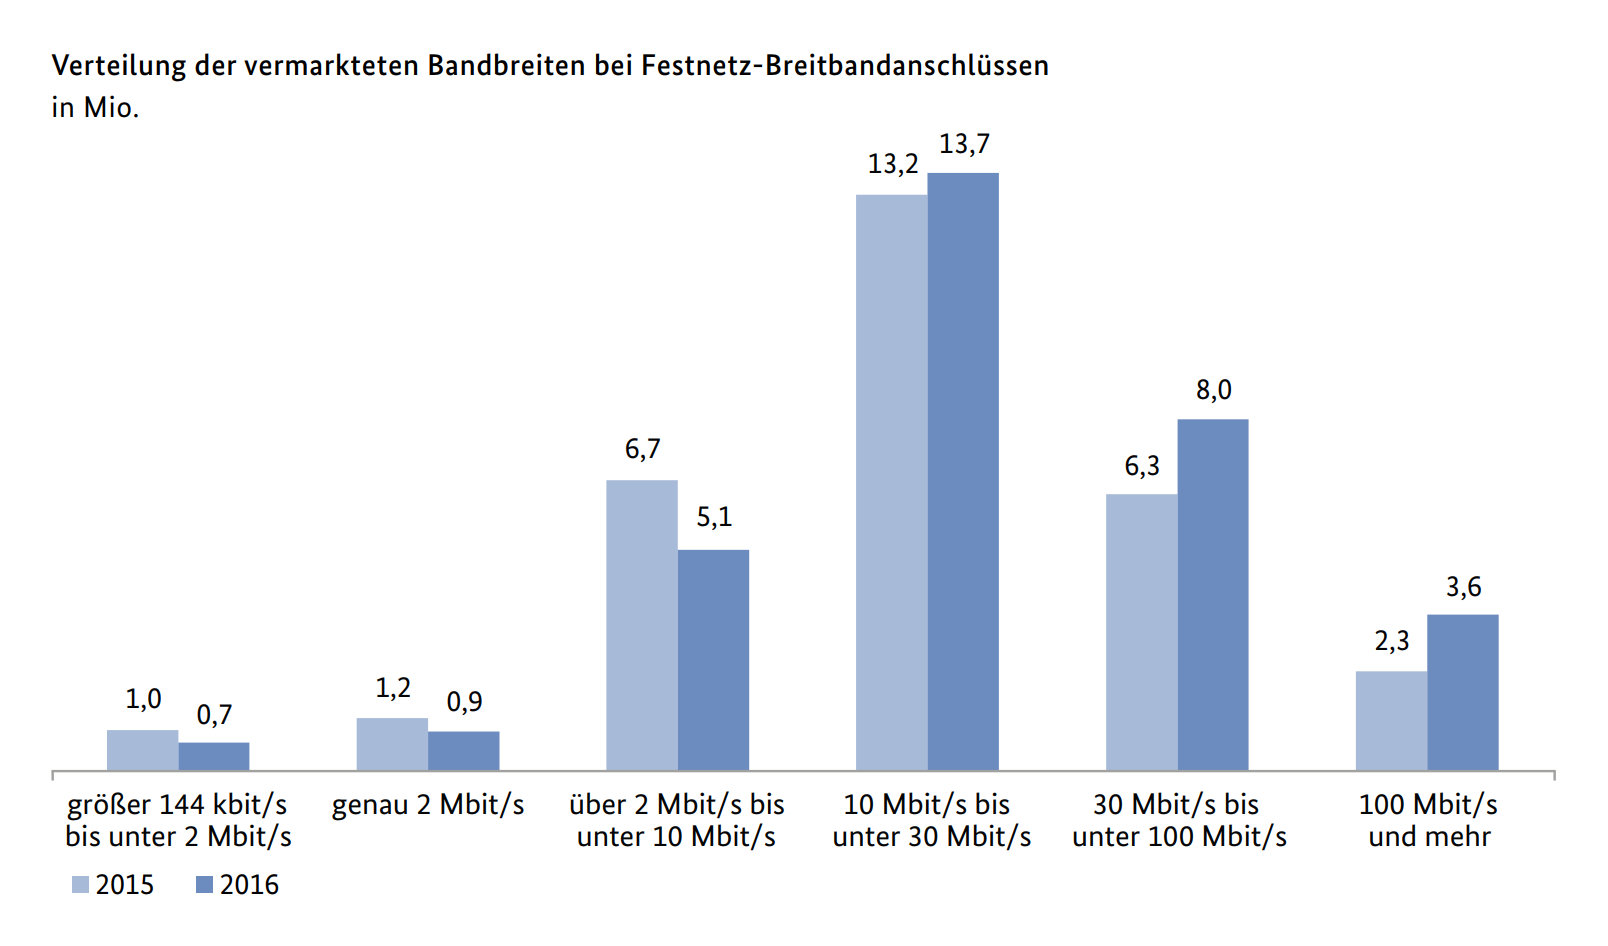 Bandbreite pro Festnetz-Breitbandanschluss